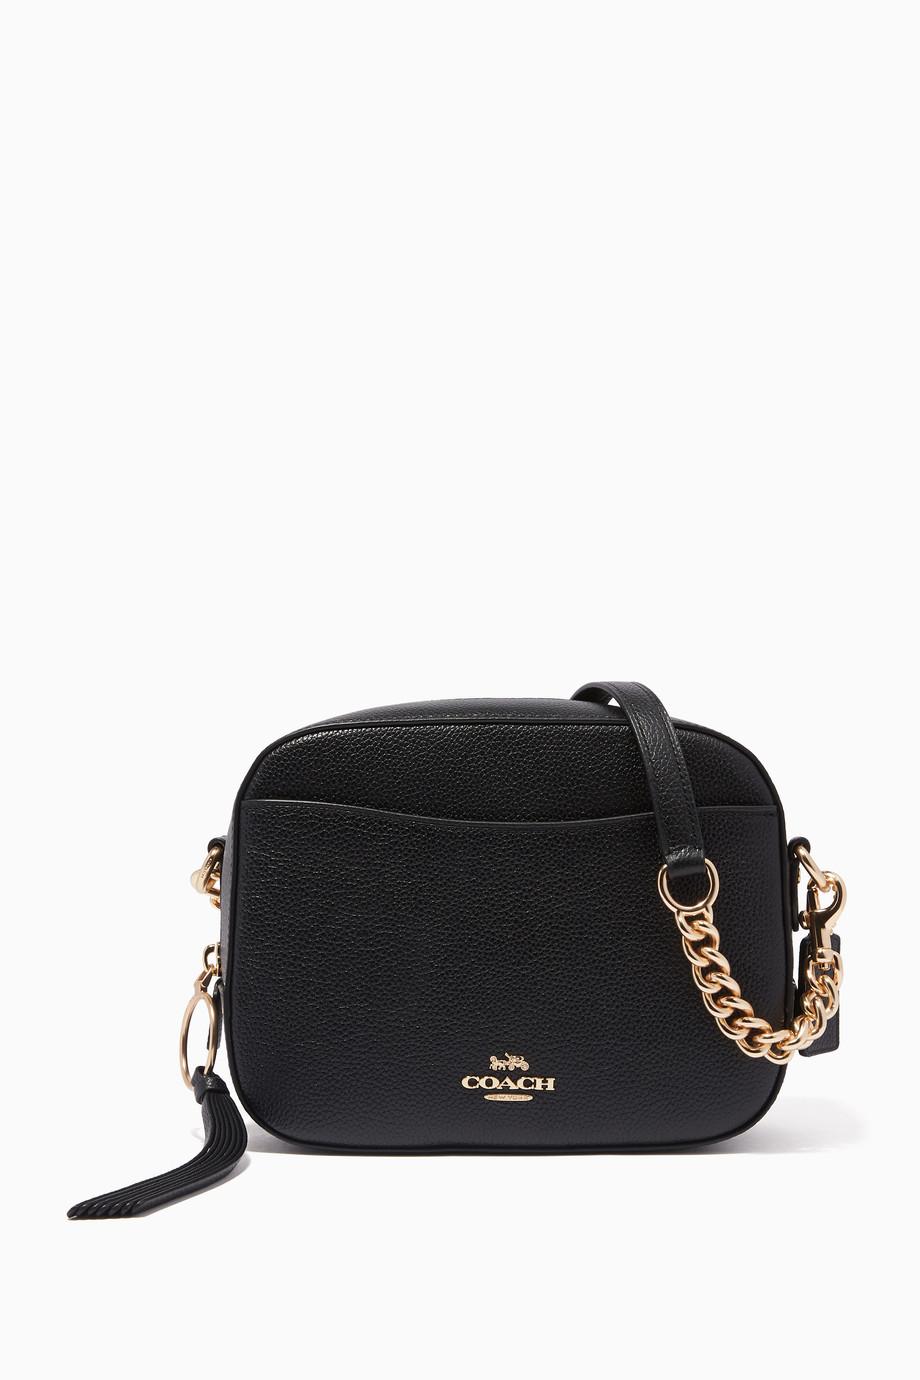 7c95226bbe6d0 تسوق حقيبة كروس كاميرا صغيرة سوداء Coach أسود للنساء